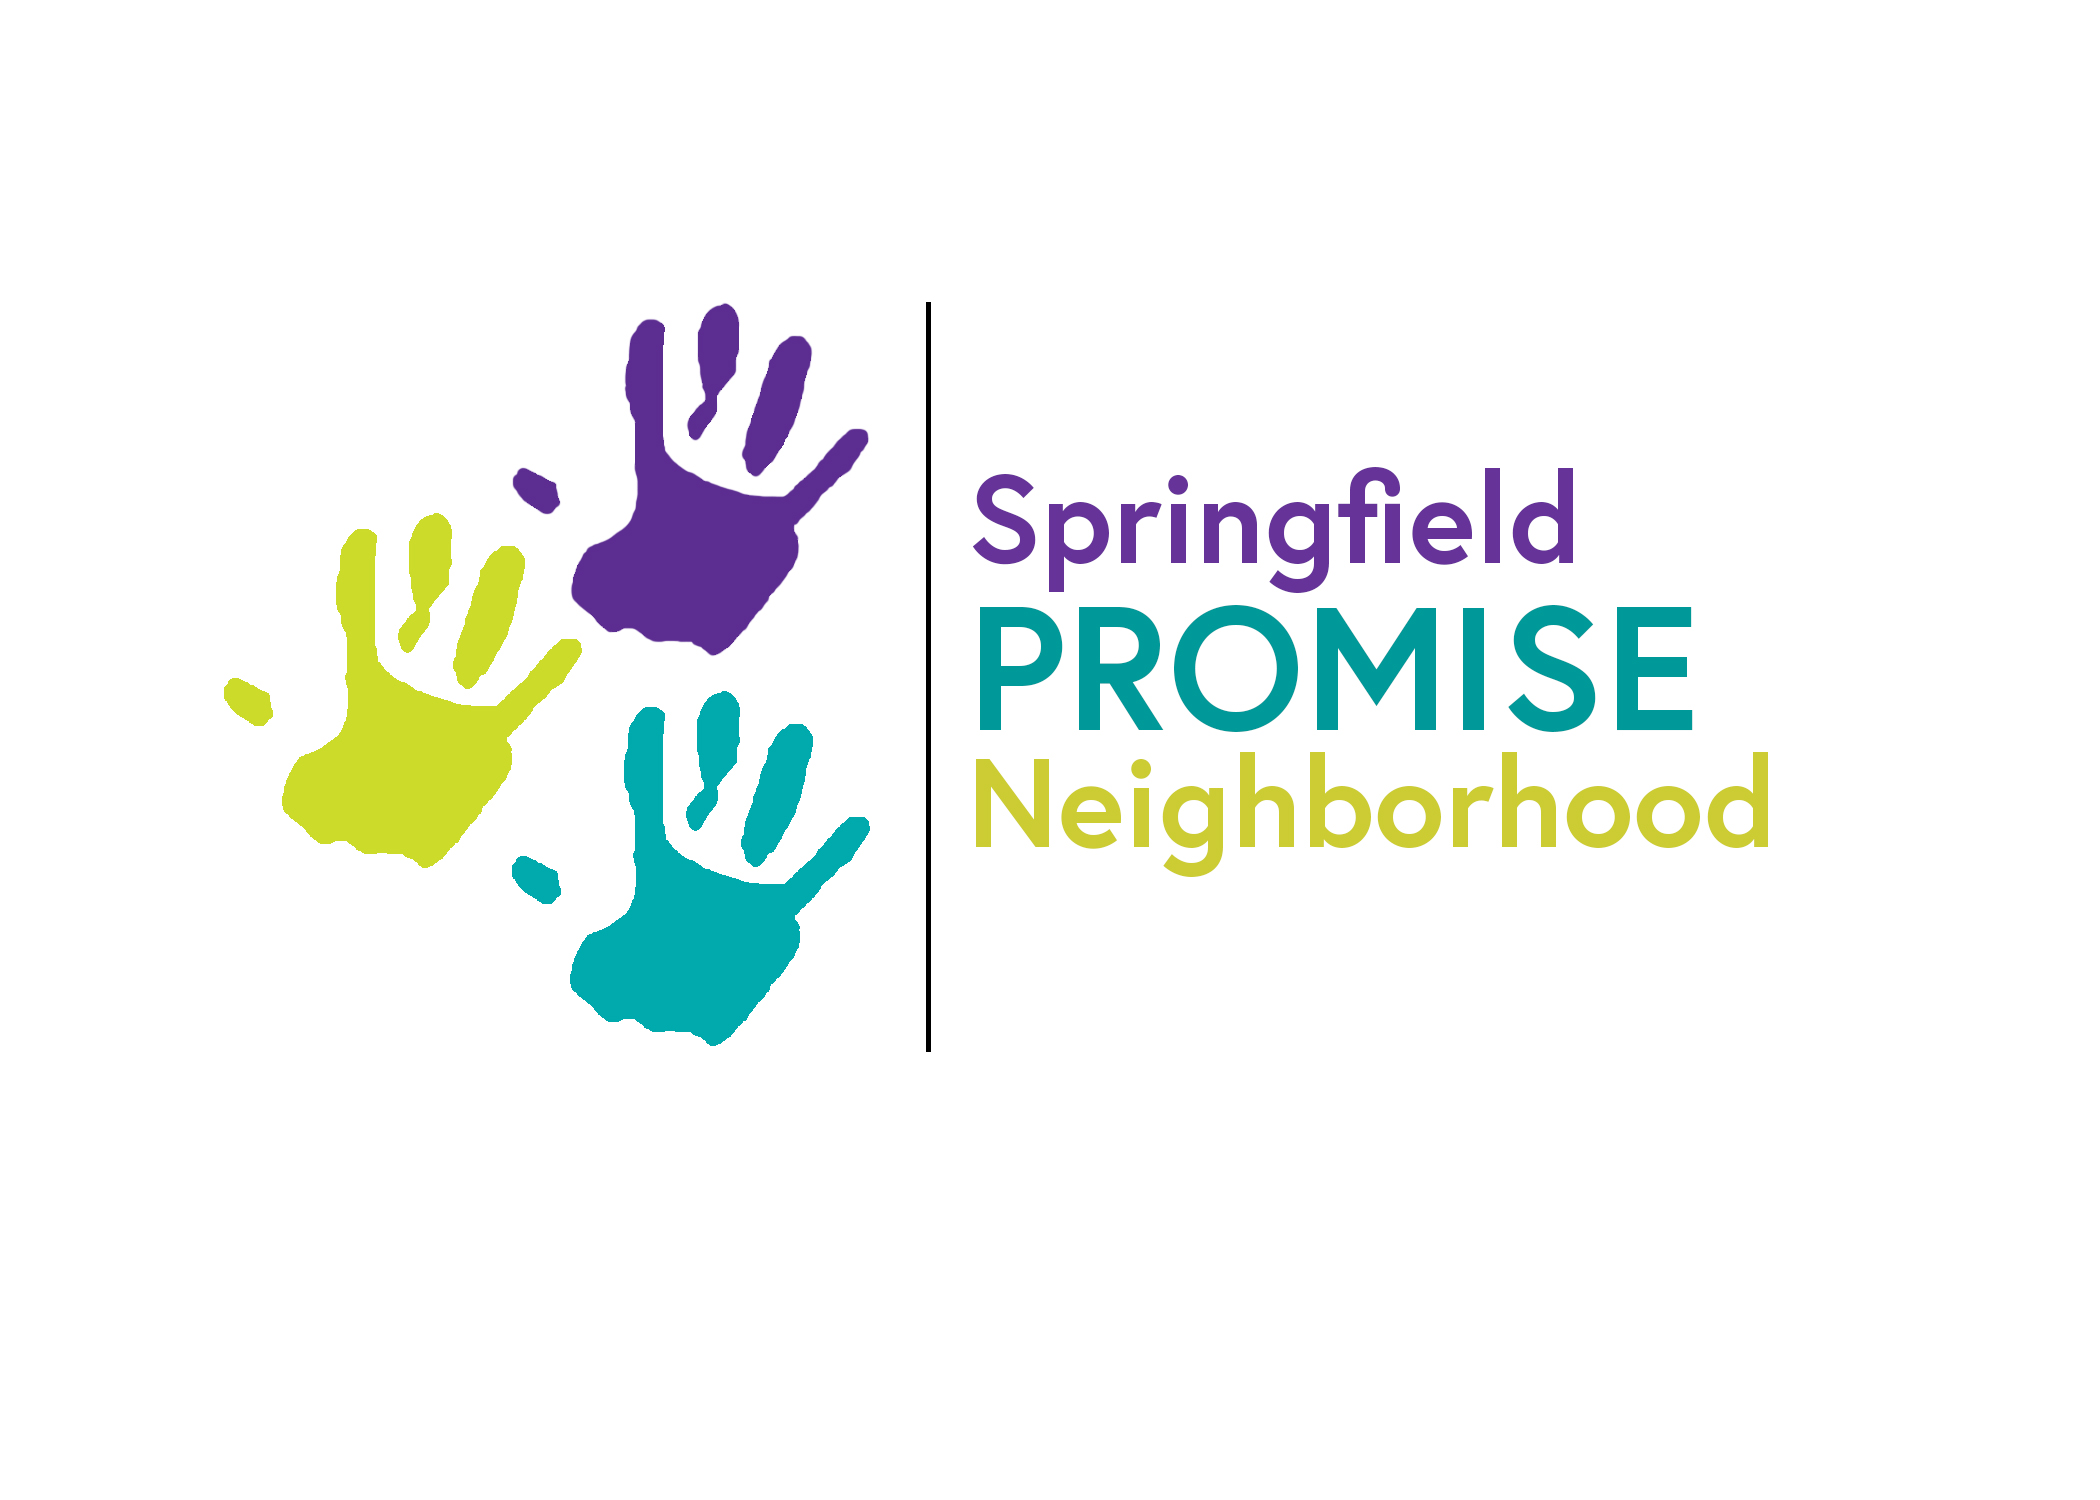 springfield_promise_logo_update-1519971194